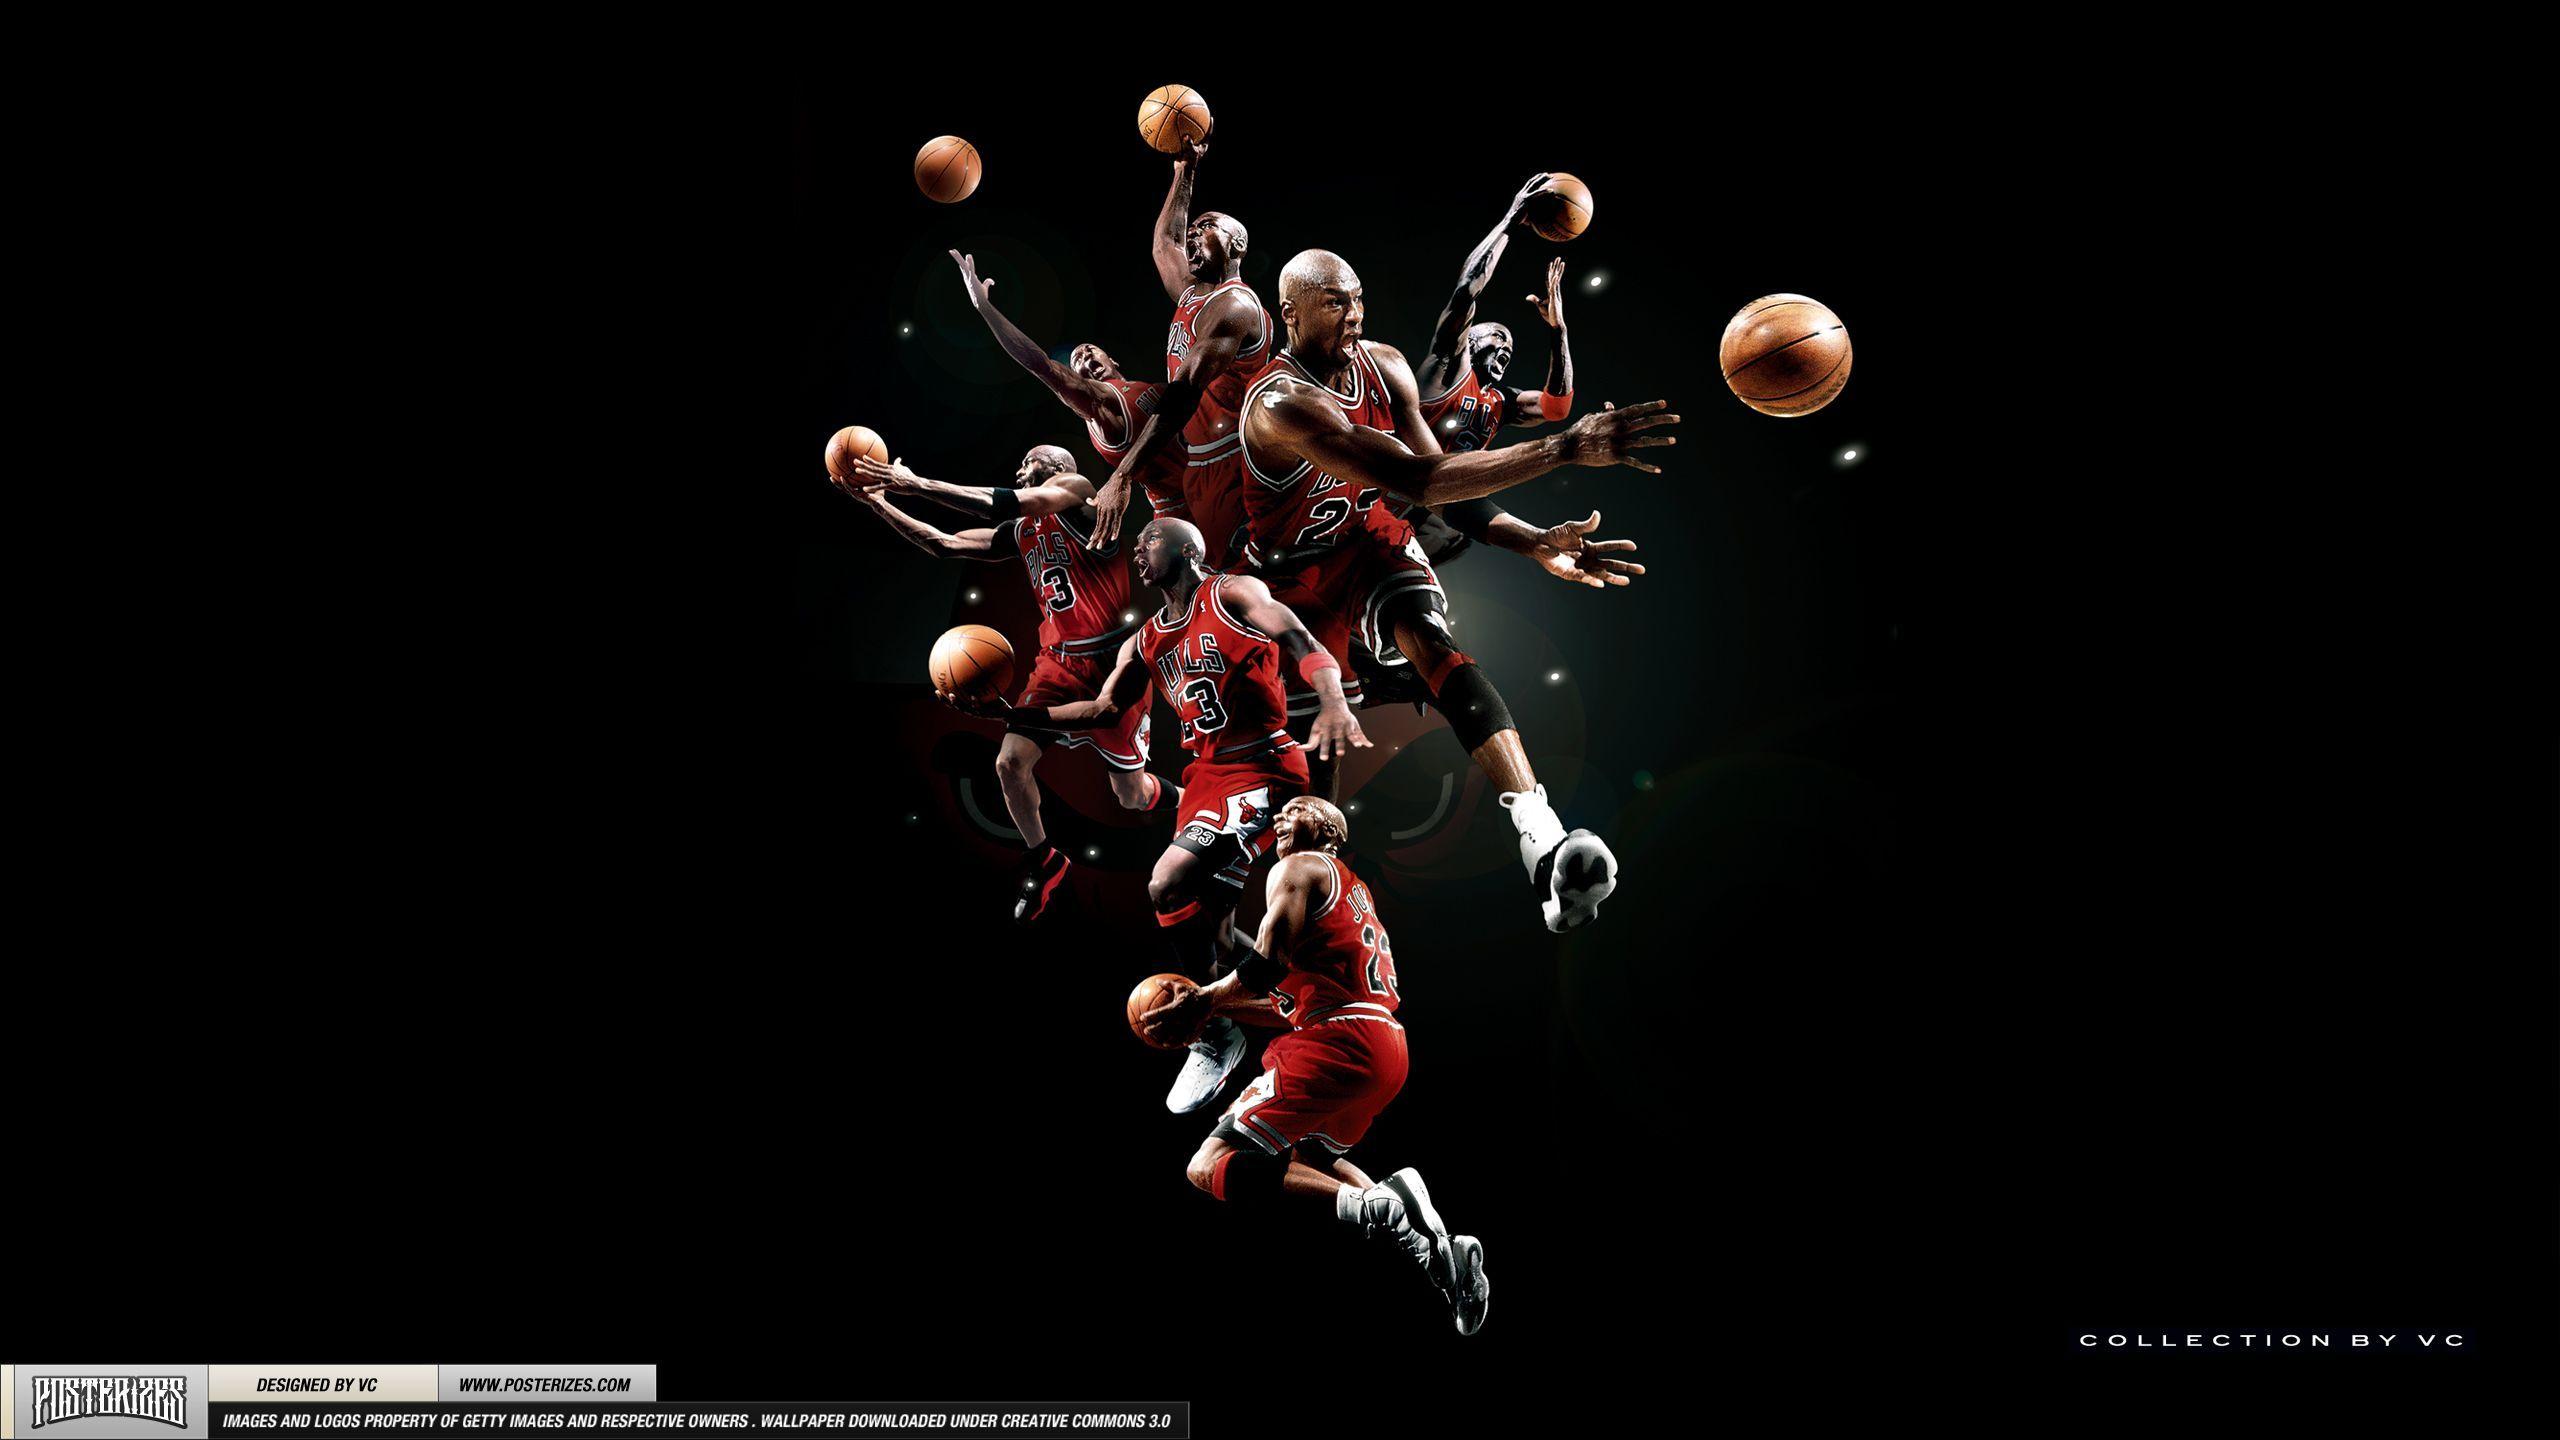 Michael Jordan Wallpaper Hd Jordan Wallpapers Hd Free Download Pixelstalk Net